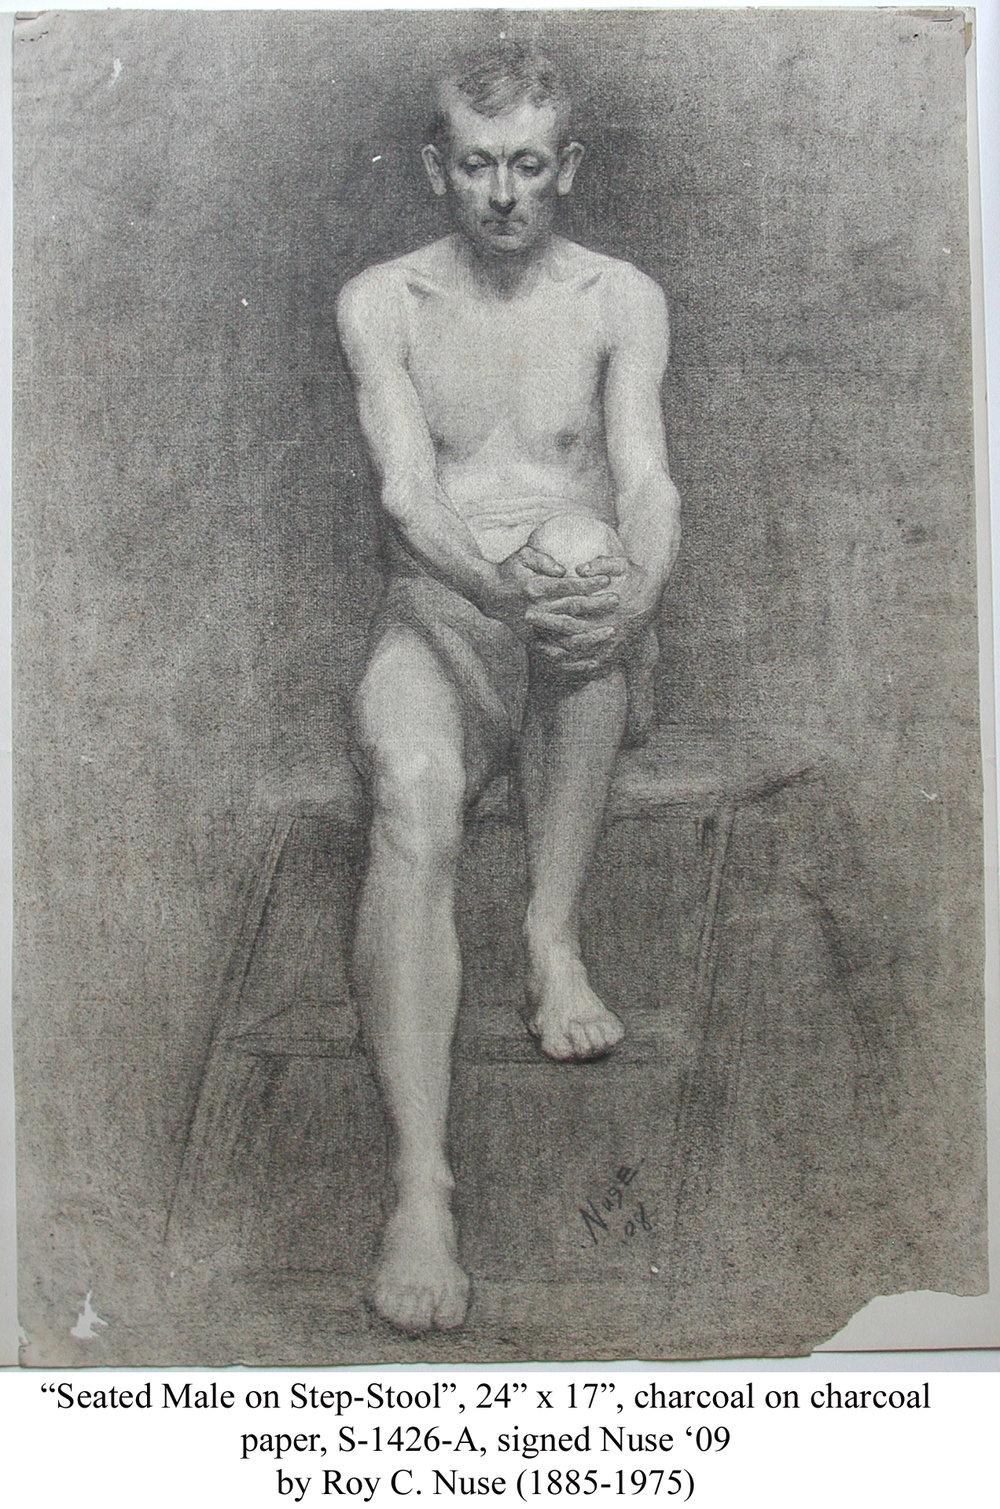 Seated Male on Step Stool P-1426-A copy.jpg